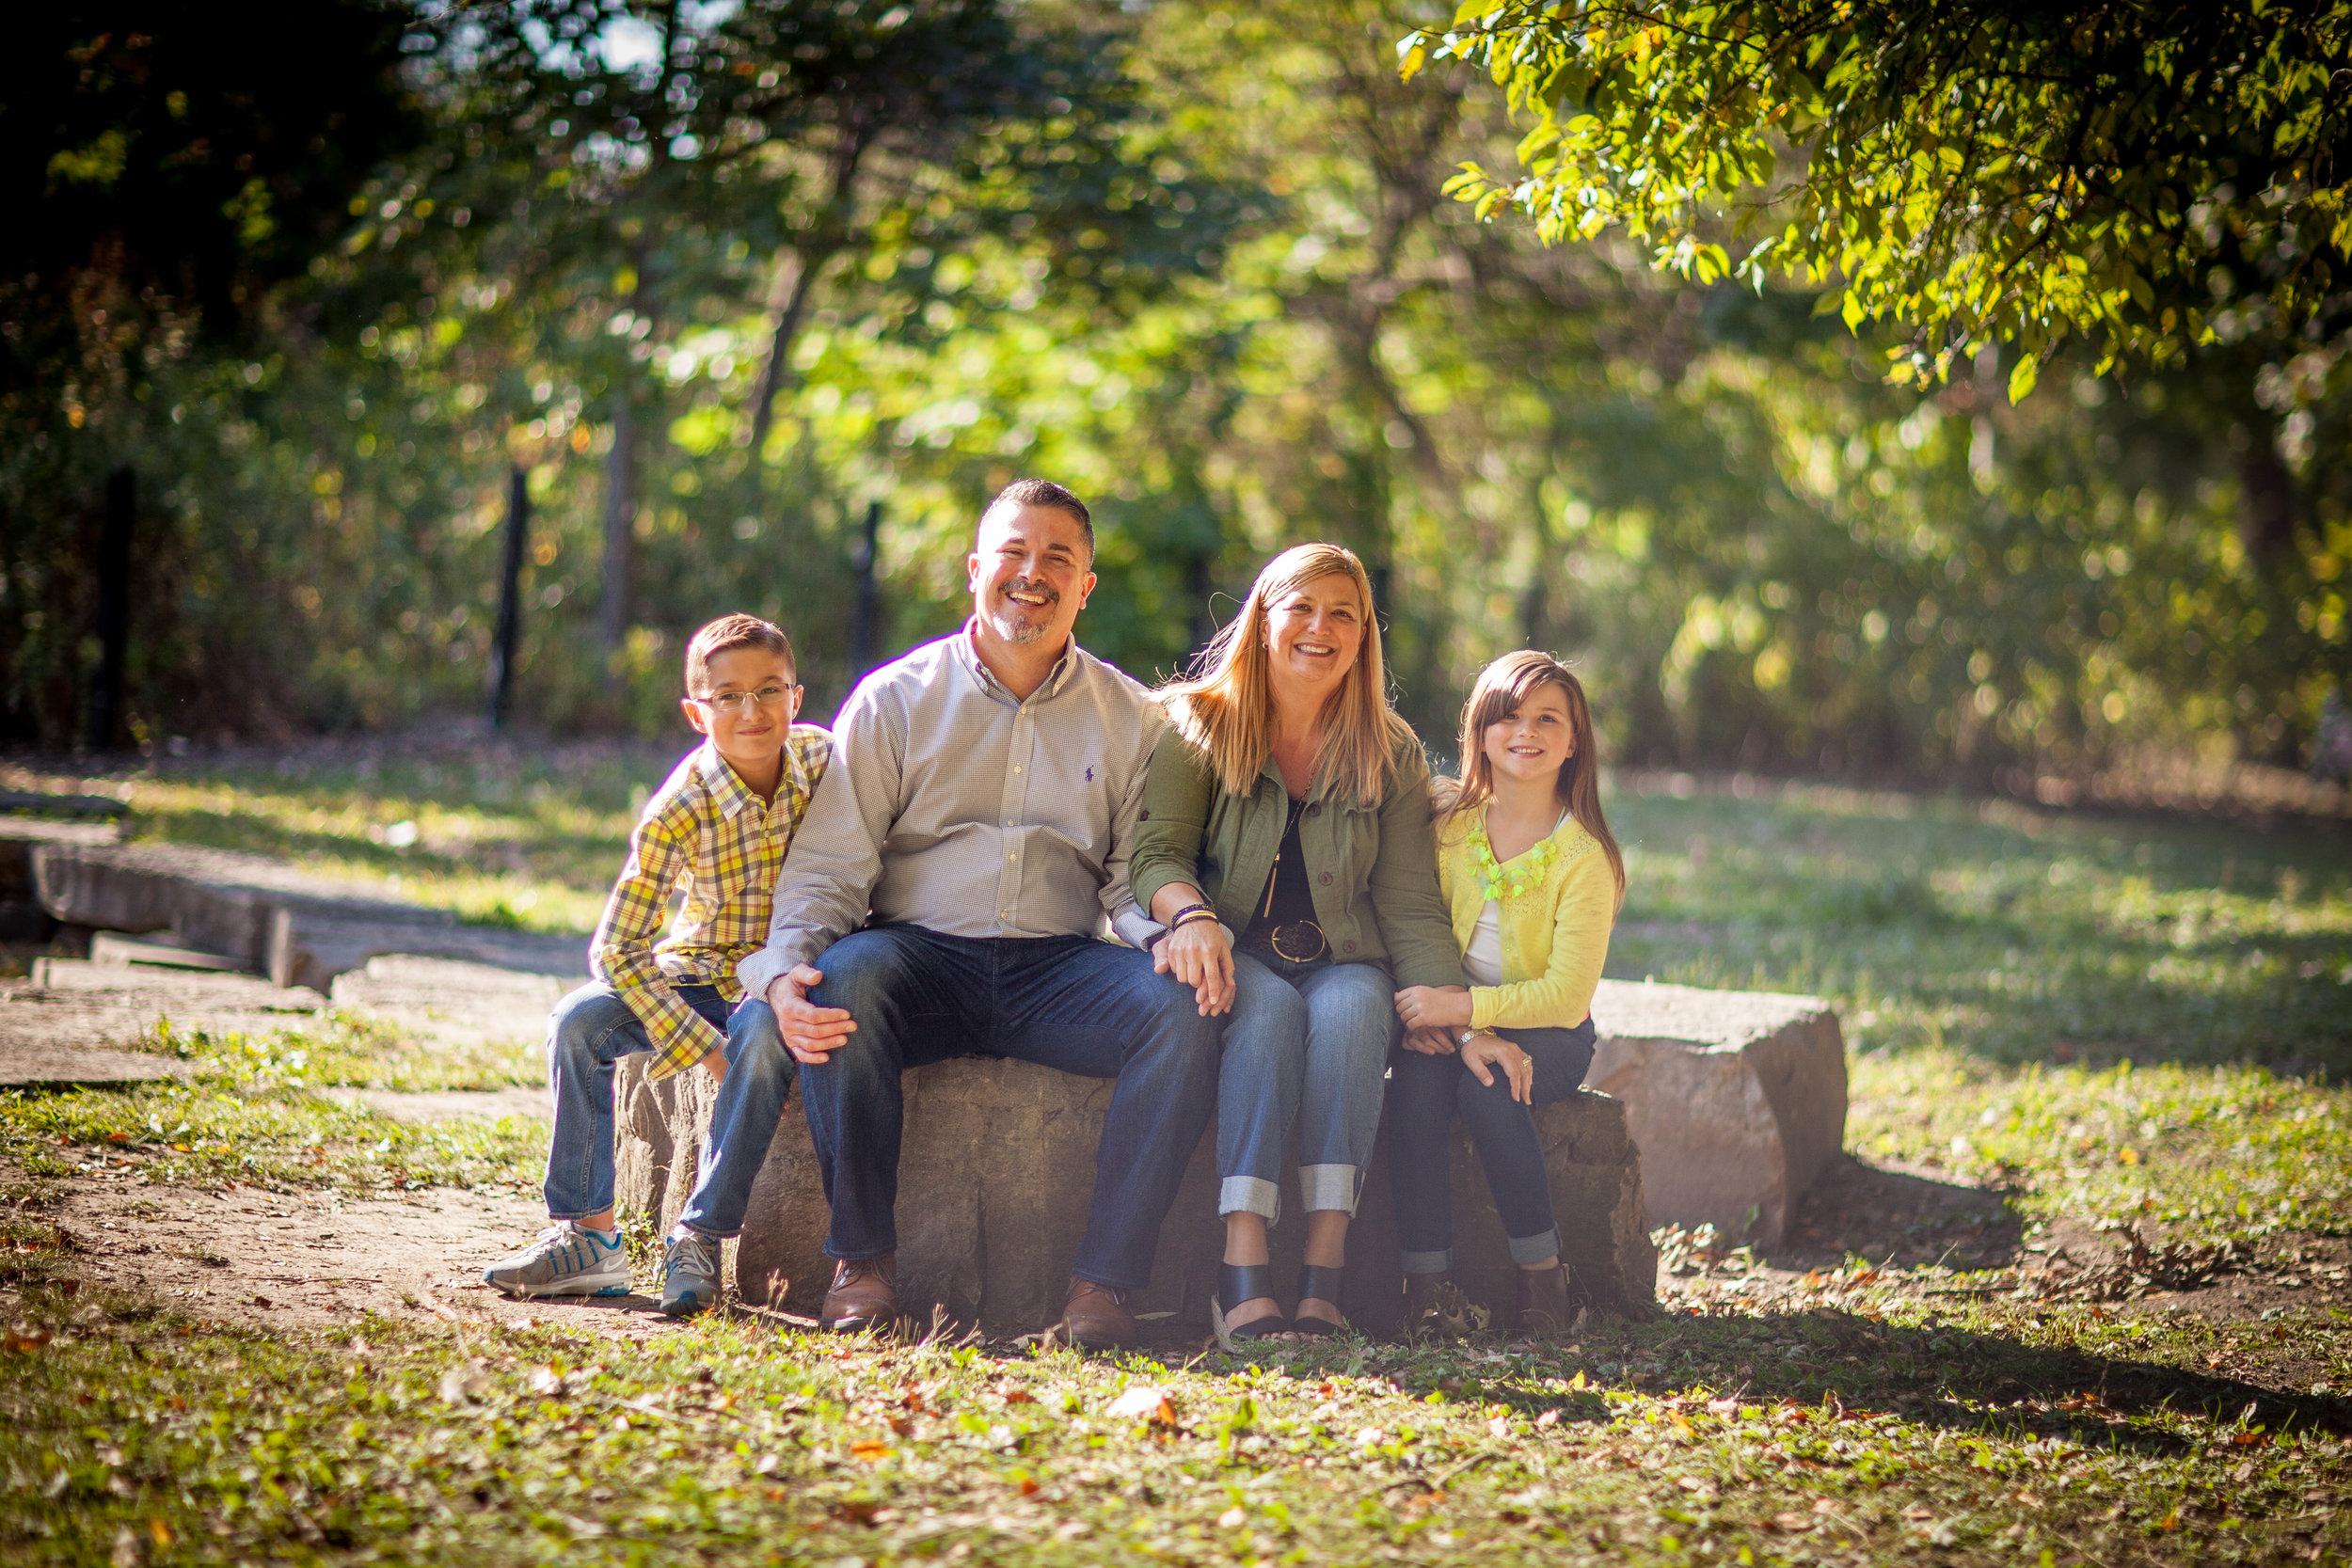 edgebrook, chicago family photographers